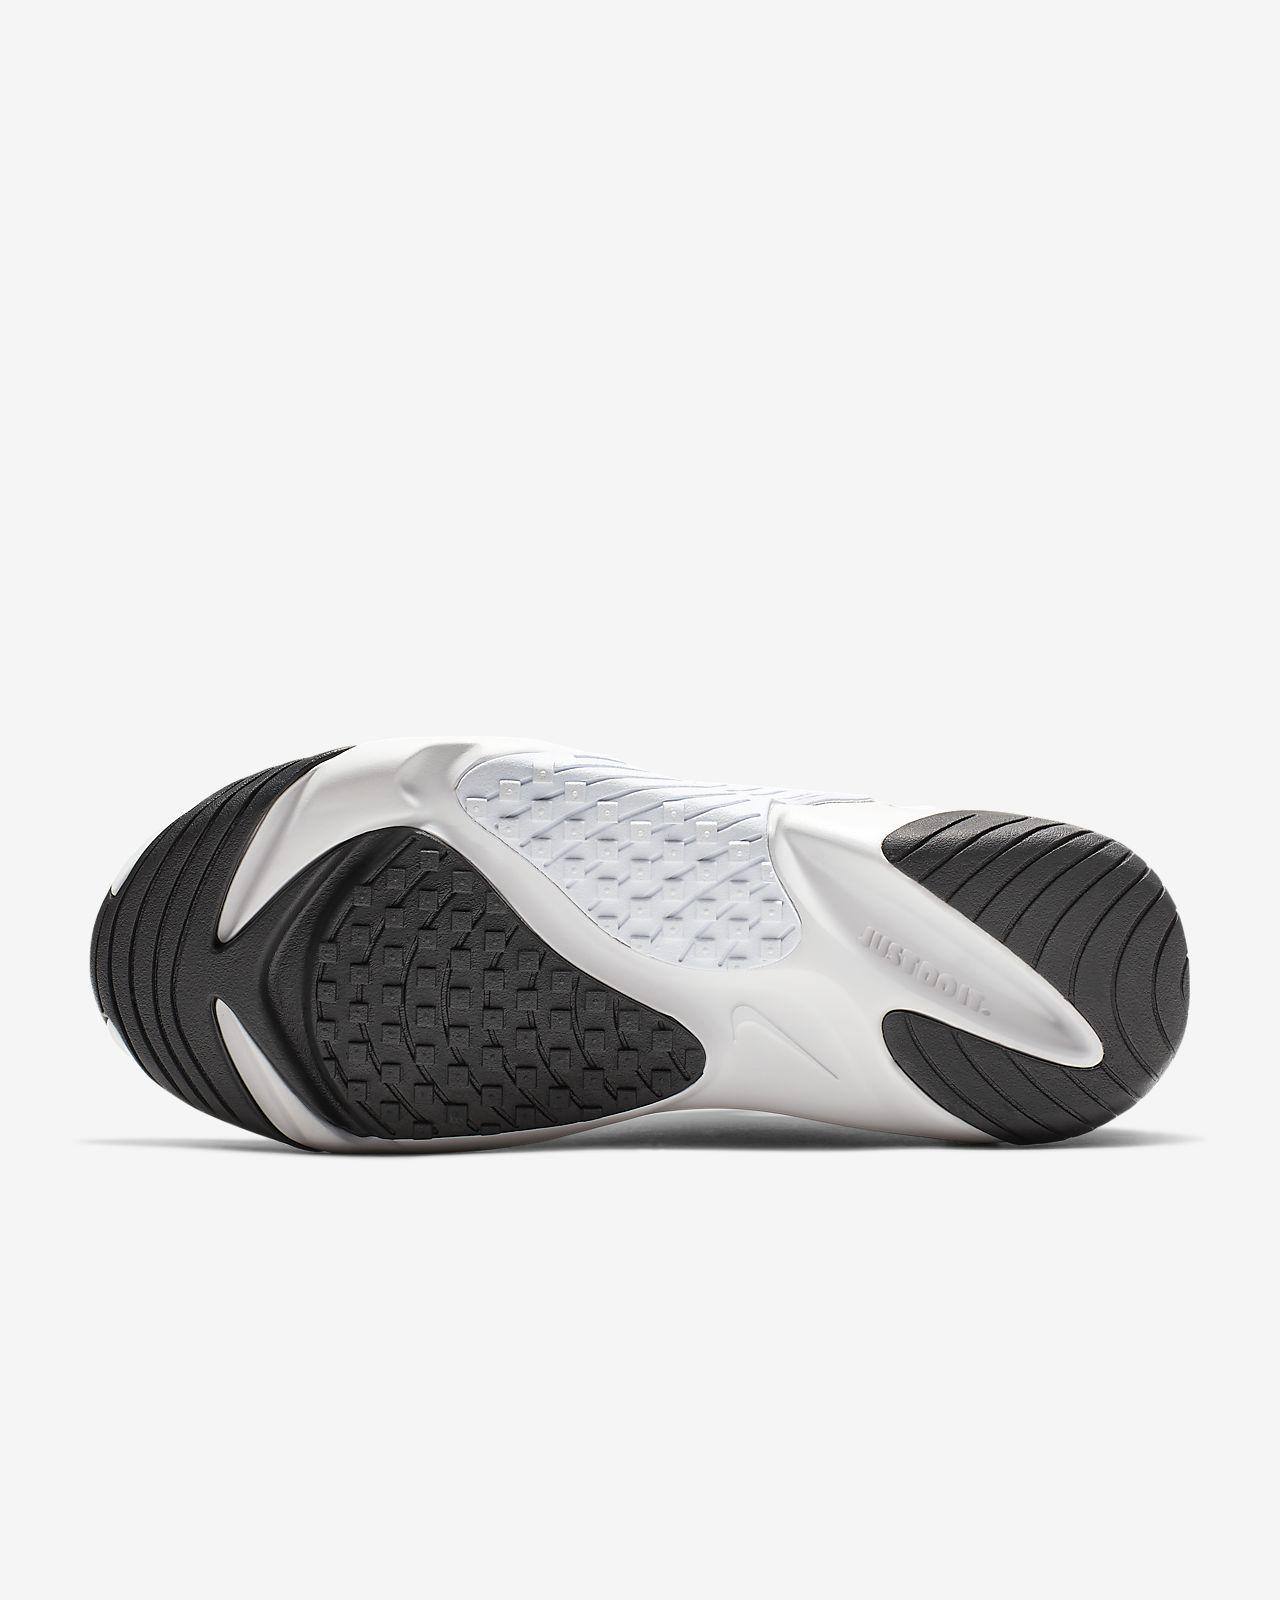 promo code 022c7 aa580 ... Nike Zoom 2K Women s Shoe